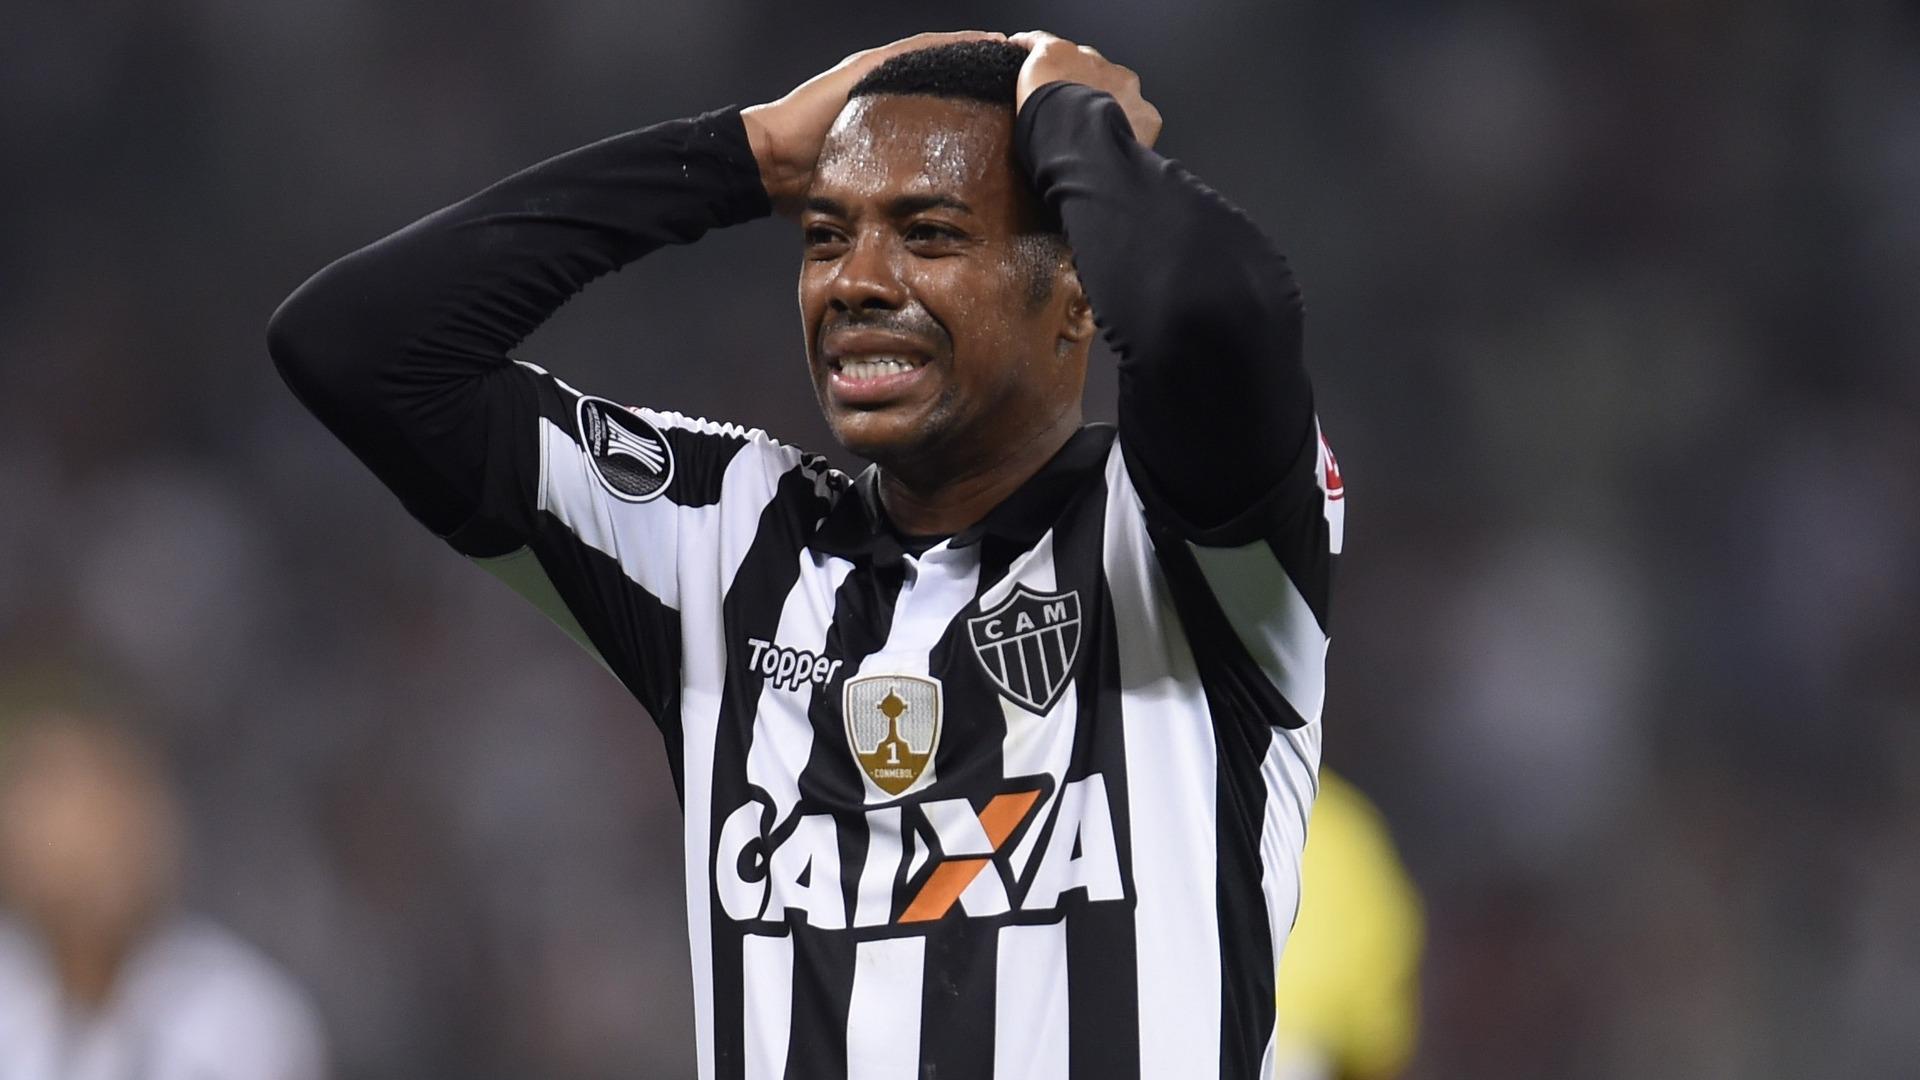 Robinho condamné à neuf ans de prison ferme pour viol